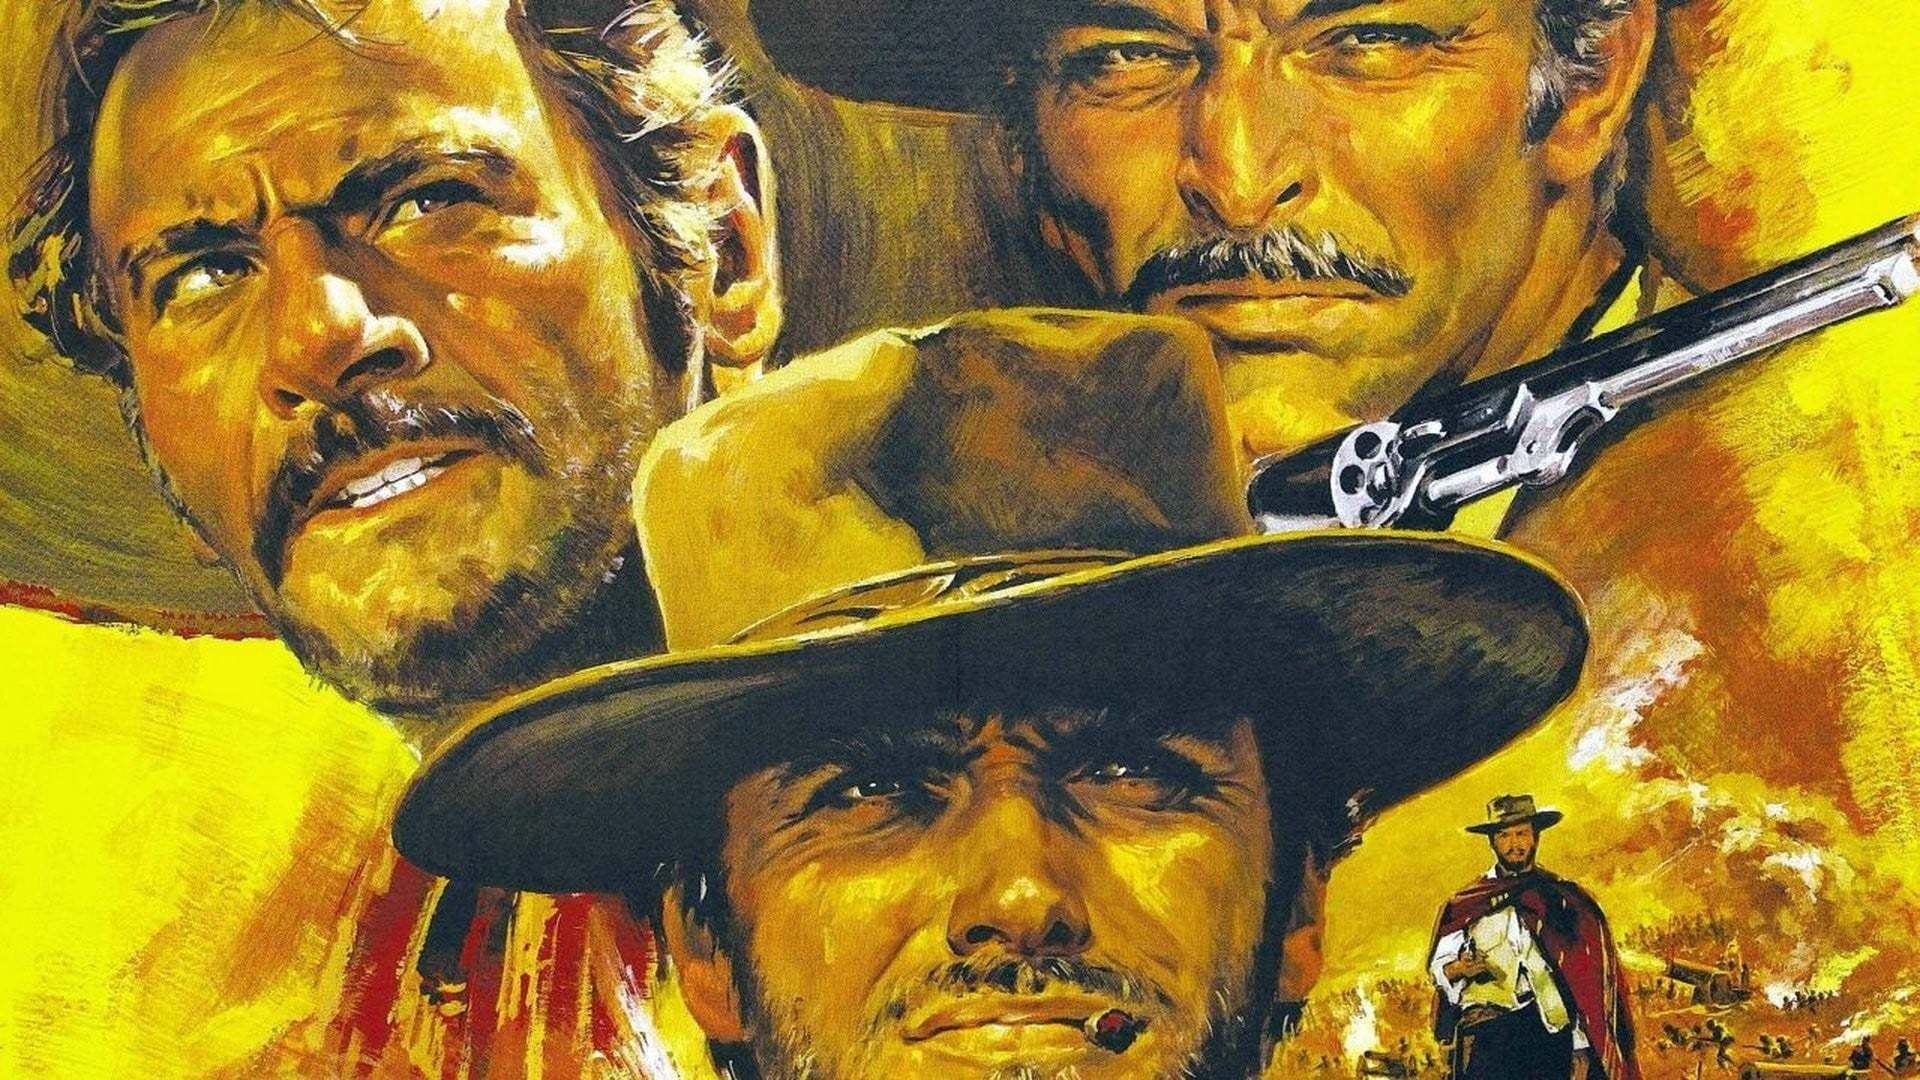 Кадры из фильма Хороший, плохой, злой Il buono, il brutto, il cattivo 1966